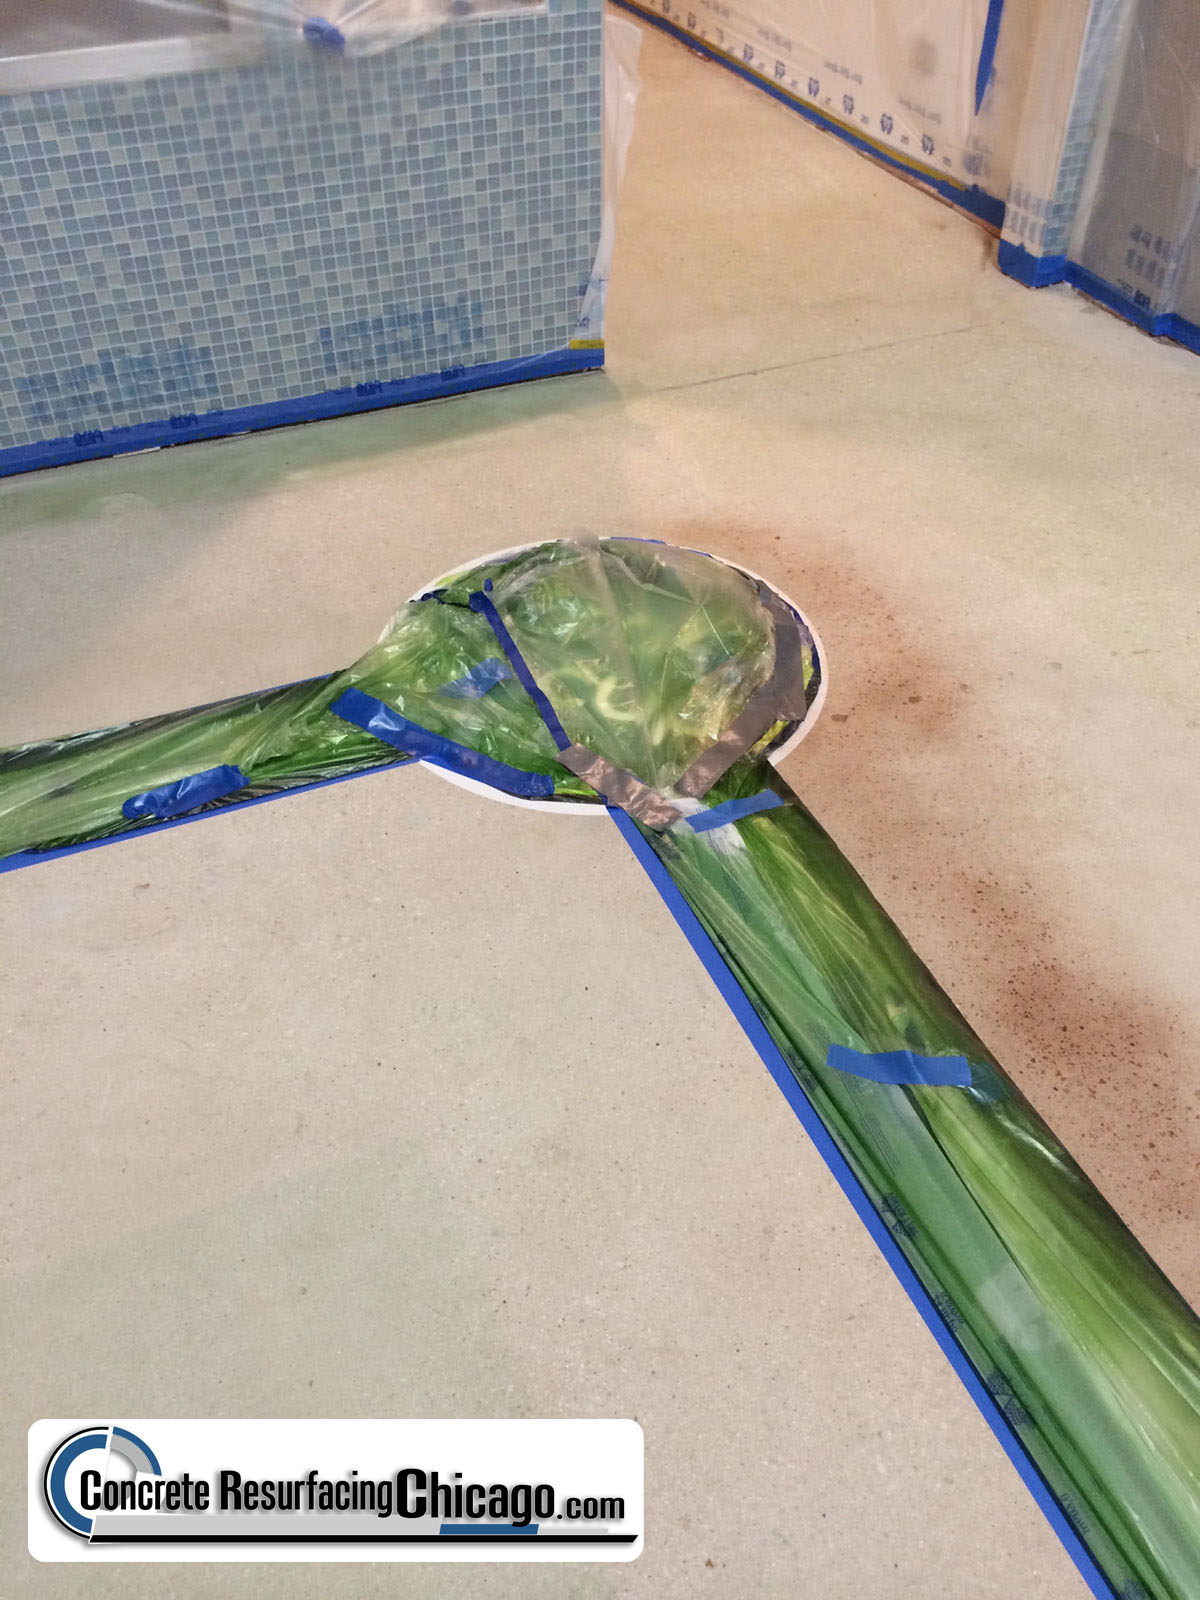 630-448-0317 - Metallic Floors Concrete Resurfacing Solutions Serving Chicagoland